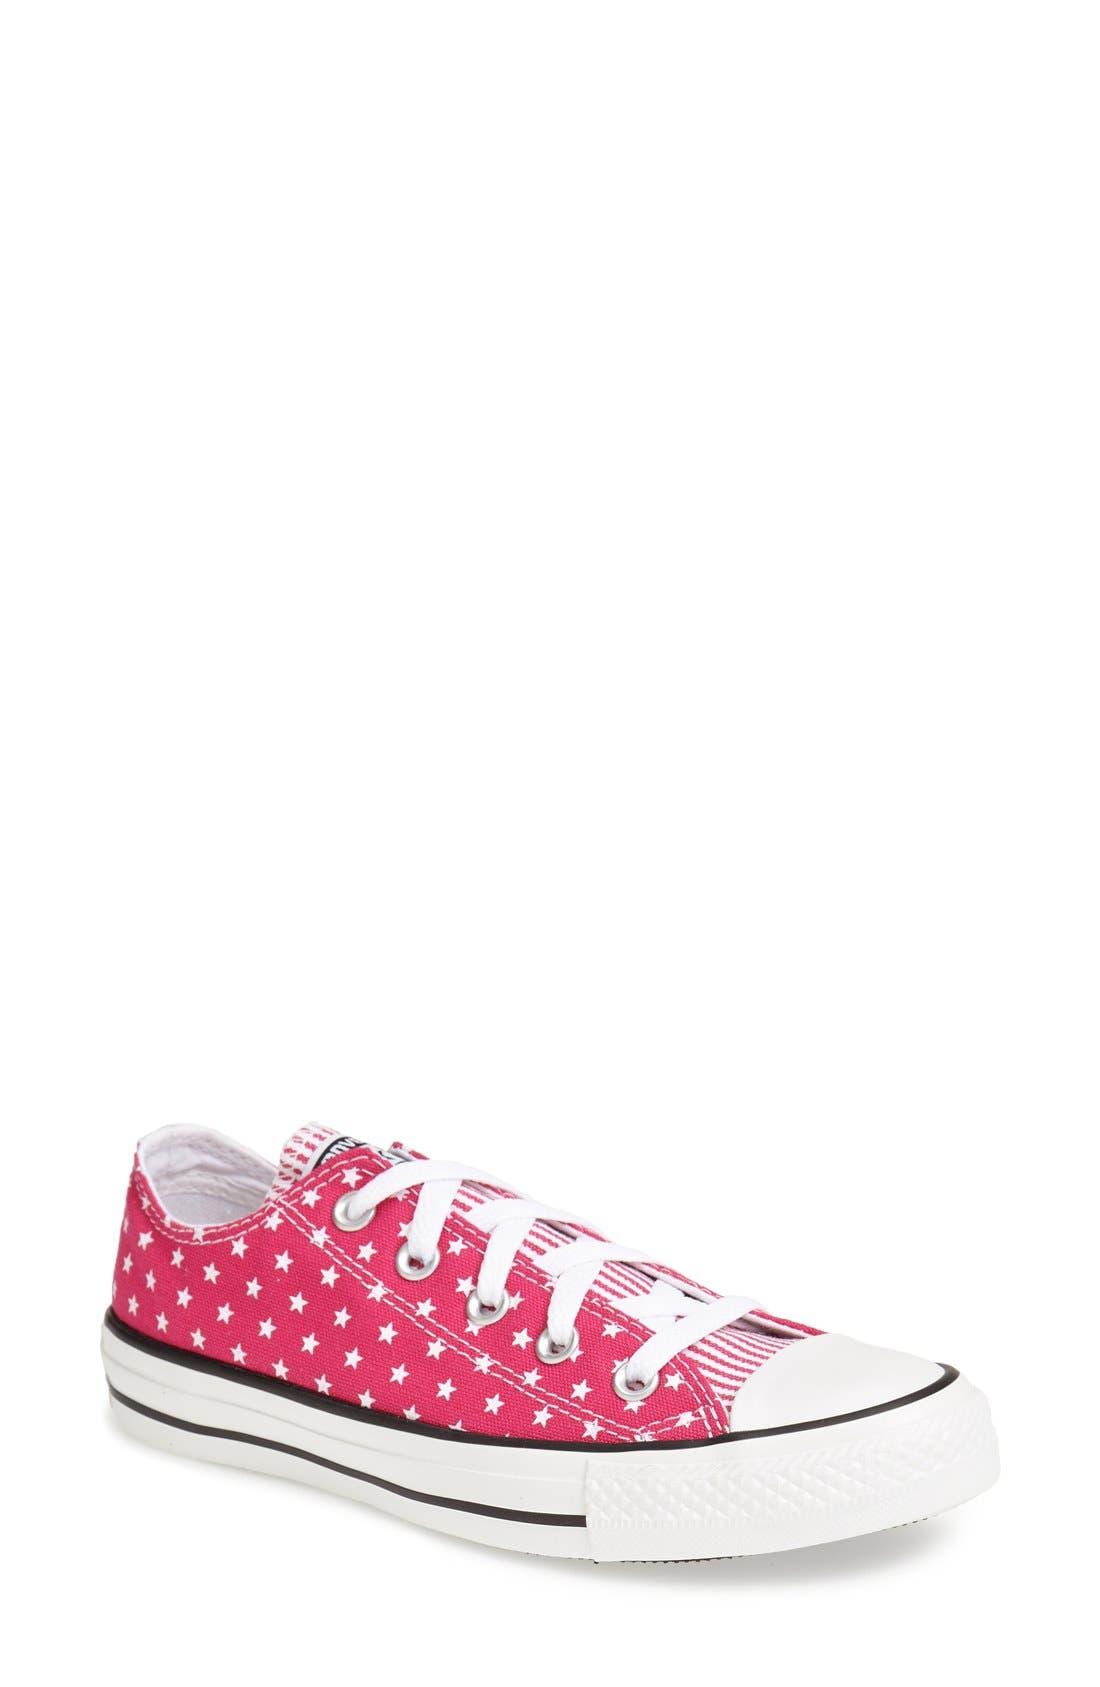 Alternate Image 1 Selected - Converse Chuck Taylor® All Star® 'Mini Stars & Bars' Low Sneaker (Women)